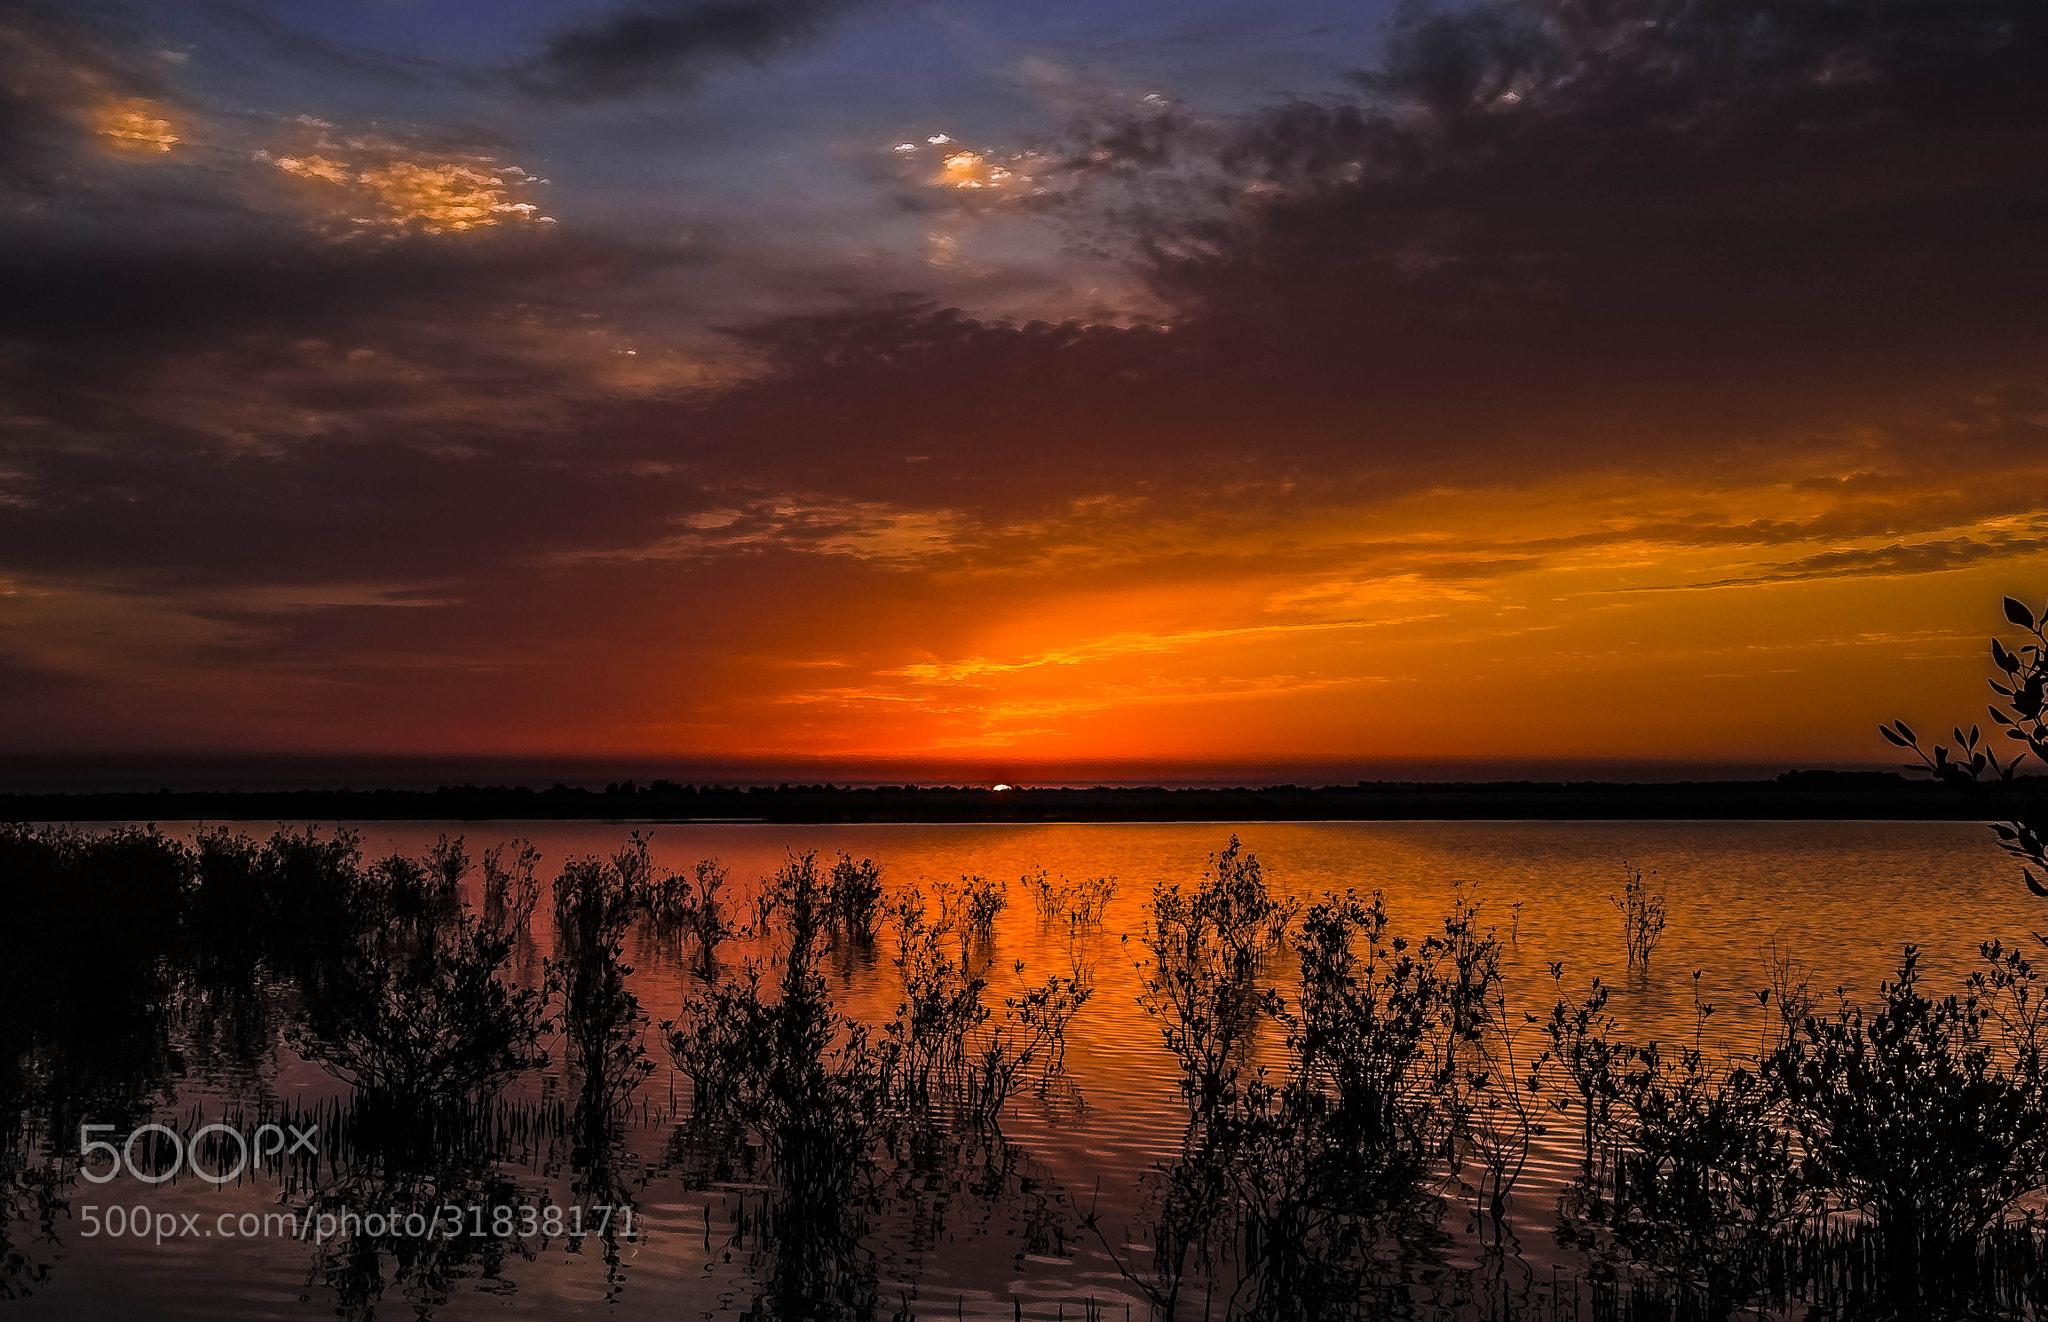 Photograph Daybreak by the Lake by julian john on 500px